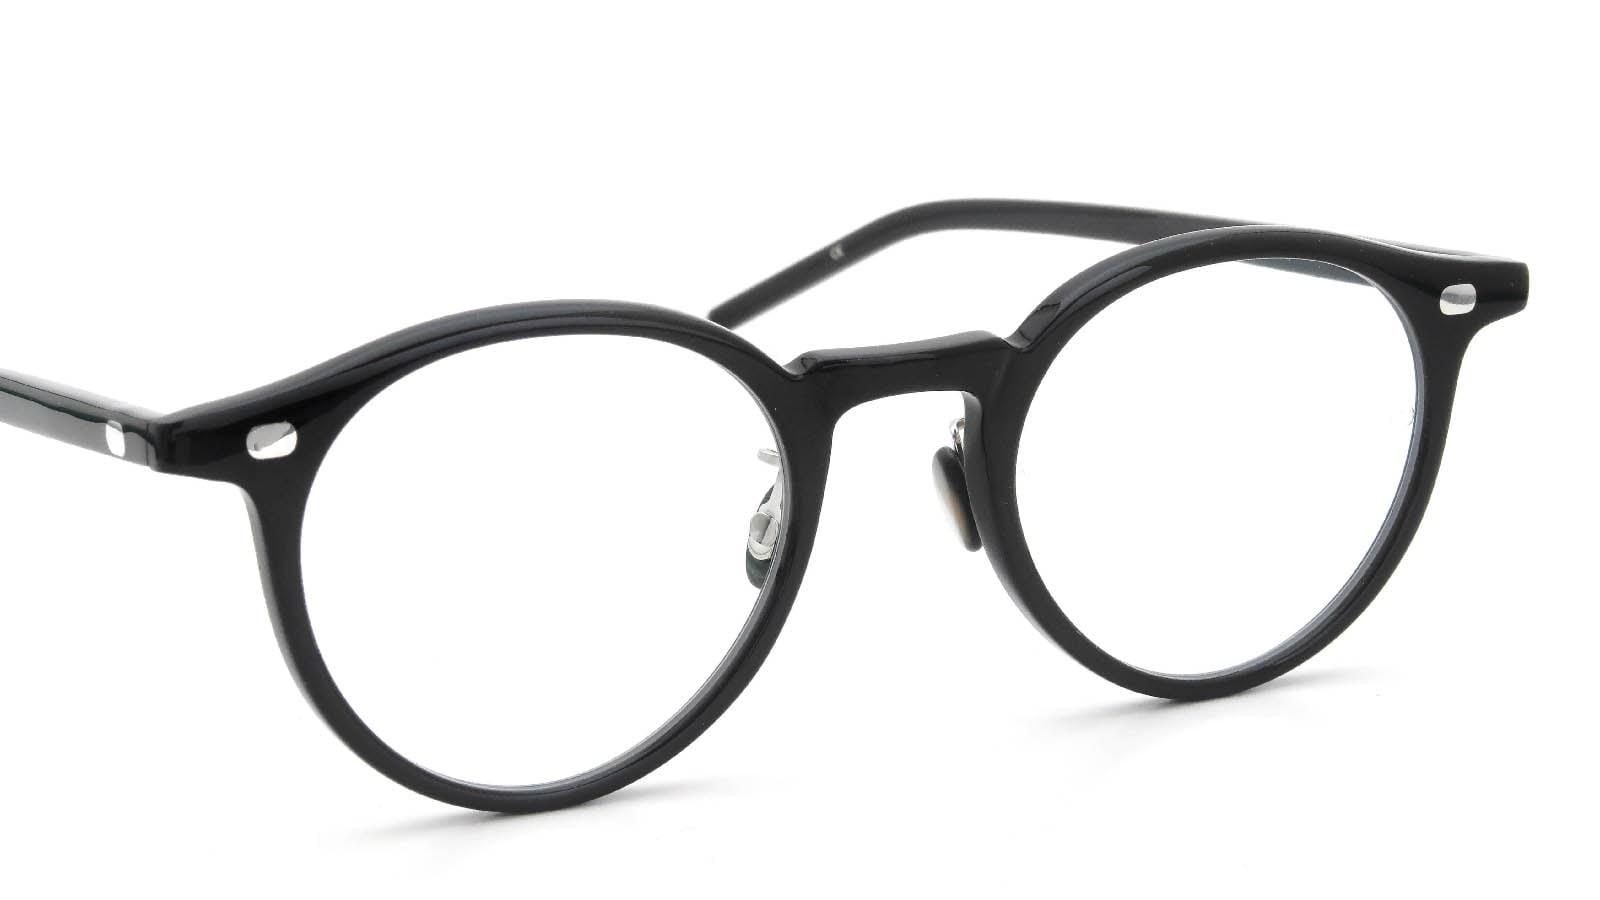 10 eyevan NO.3 Ⅲ 47size 6